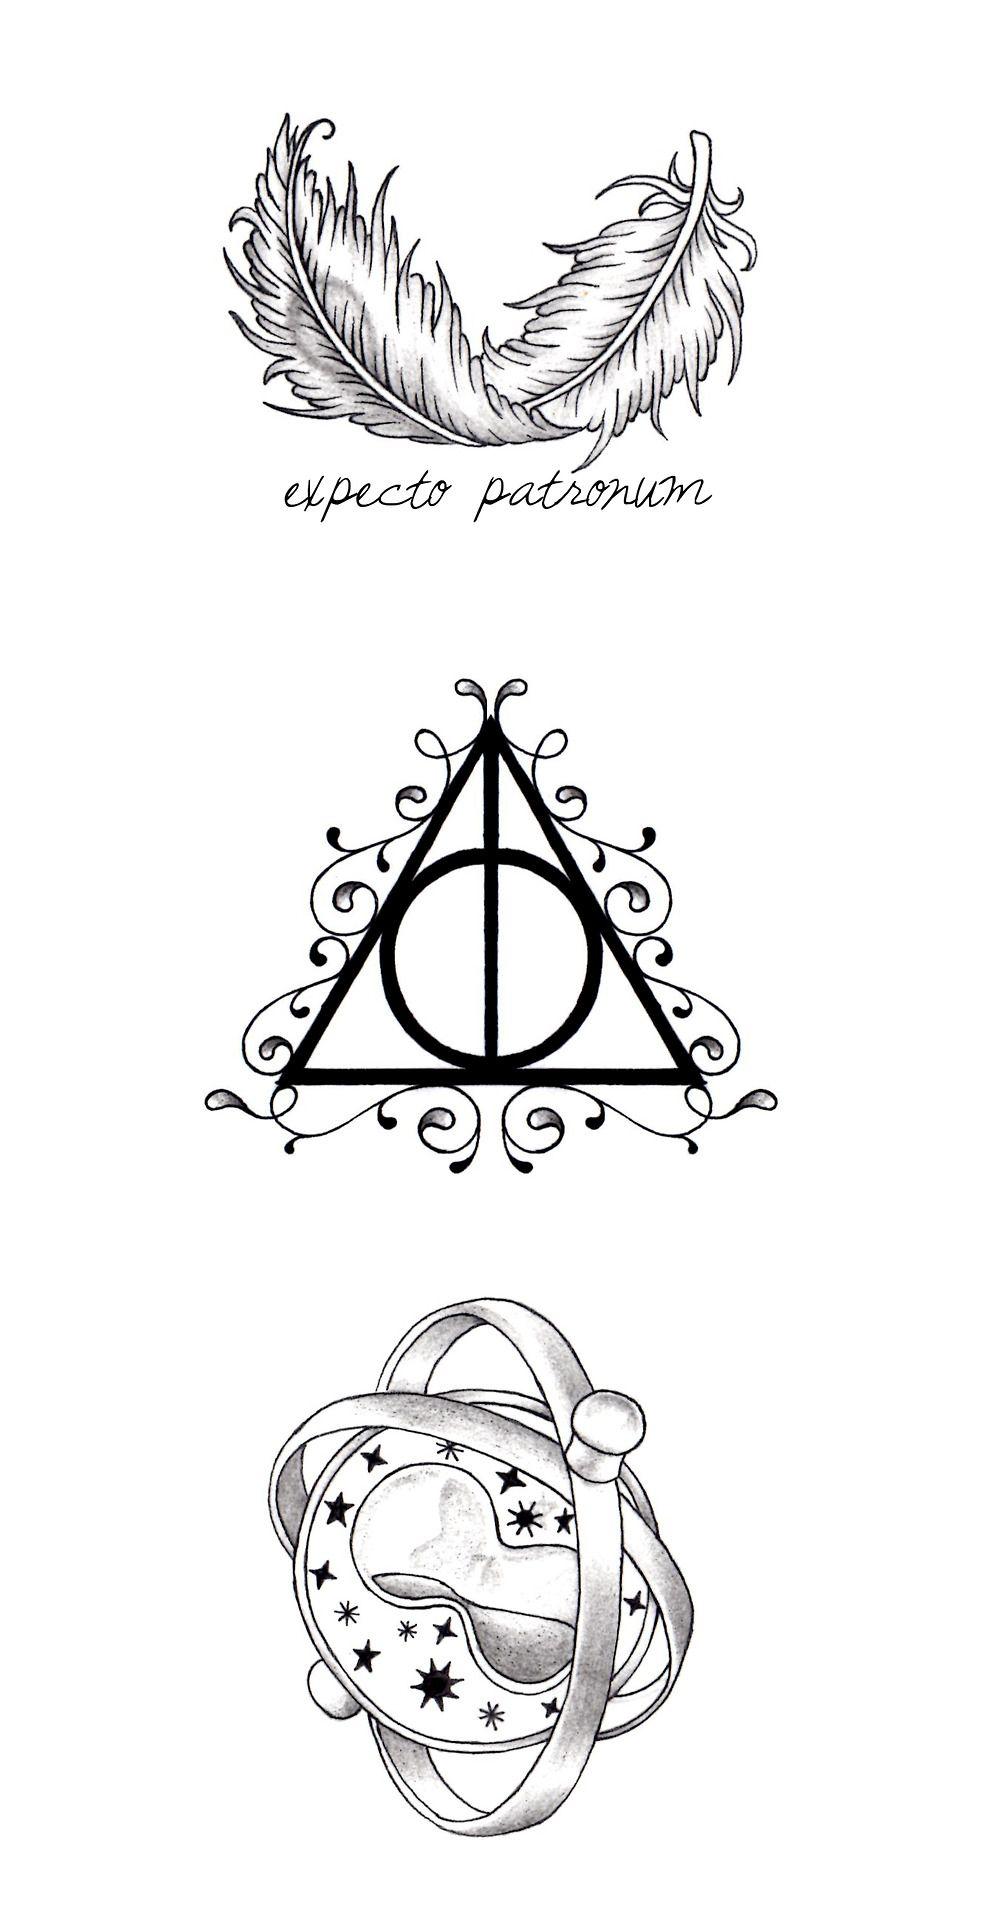 Harry Potter Tatuagens Harry Potter Tatuagem Hp Tatuagens Harry